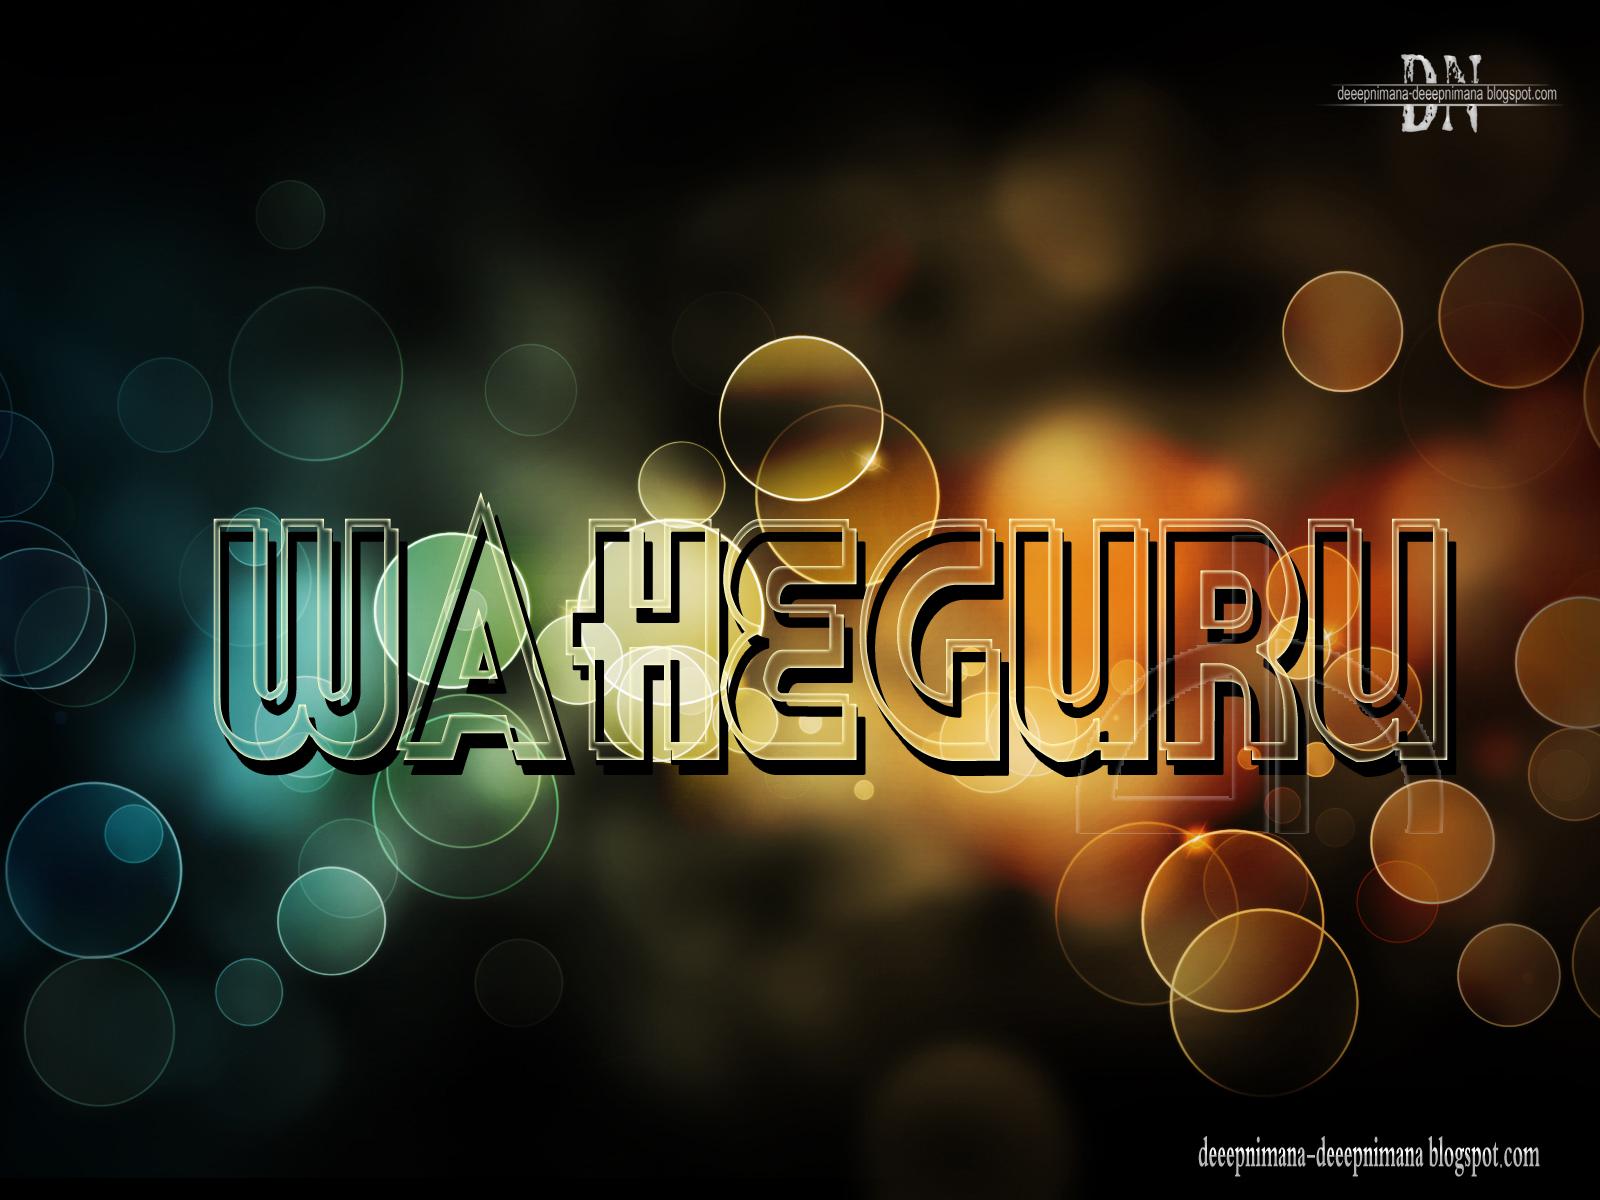 Facebook Quotes In Hindi With Wallpaper Deeepnimana Deeepnimana Blogspot Com Waheguru Naam Simran